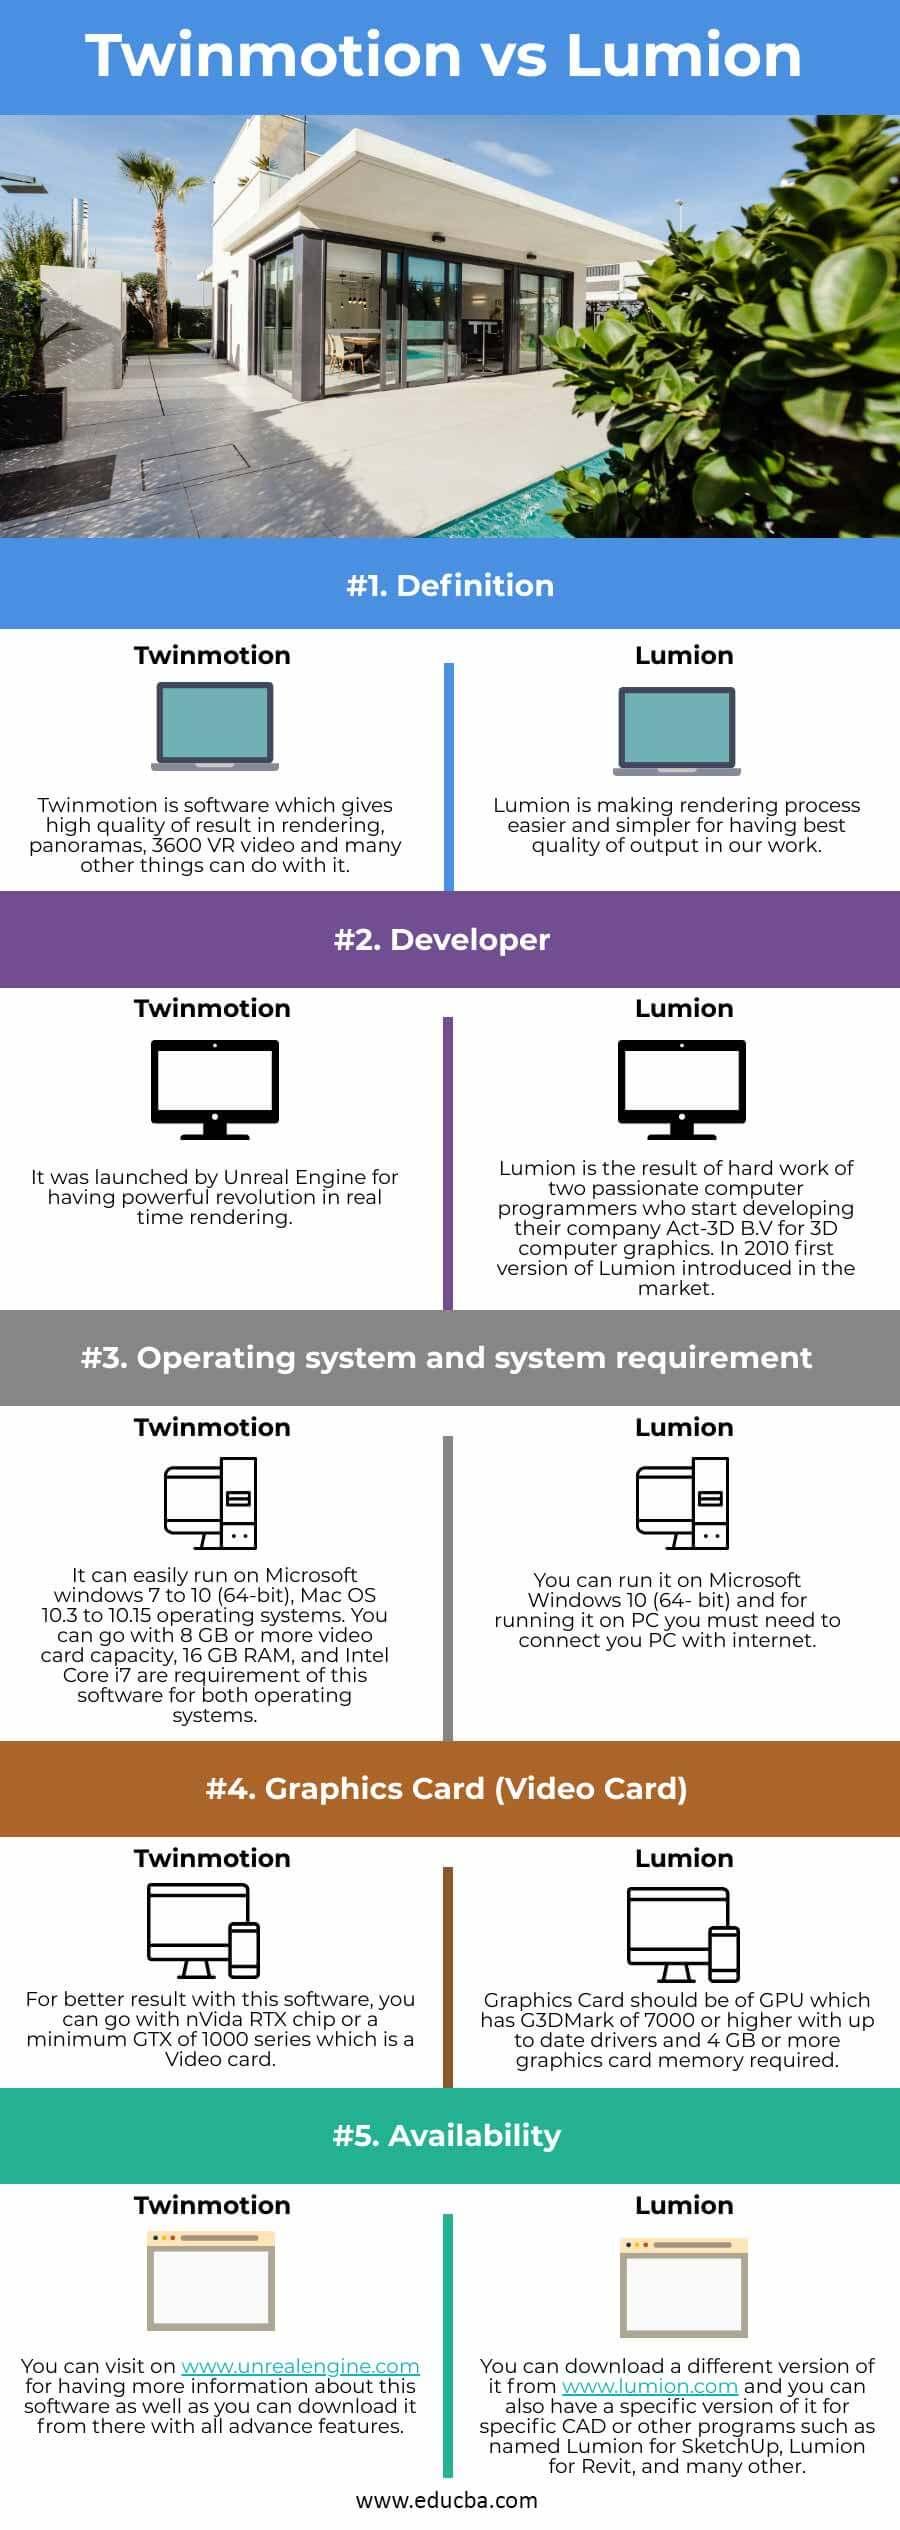 Twinmotion-vs-Lumion-info